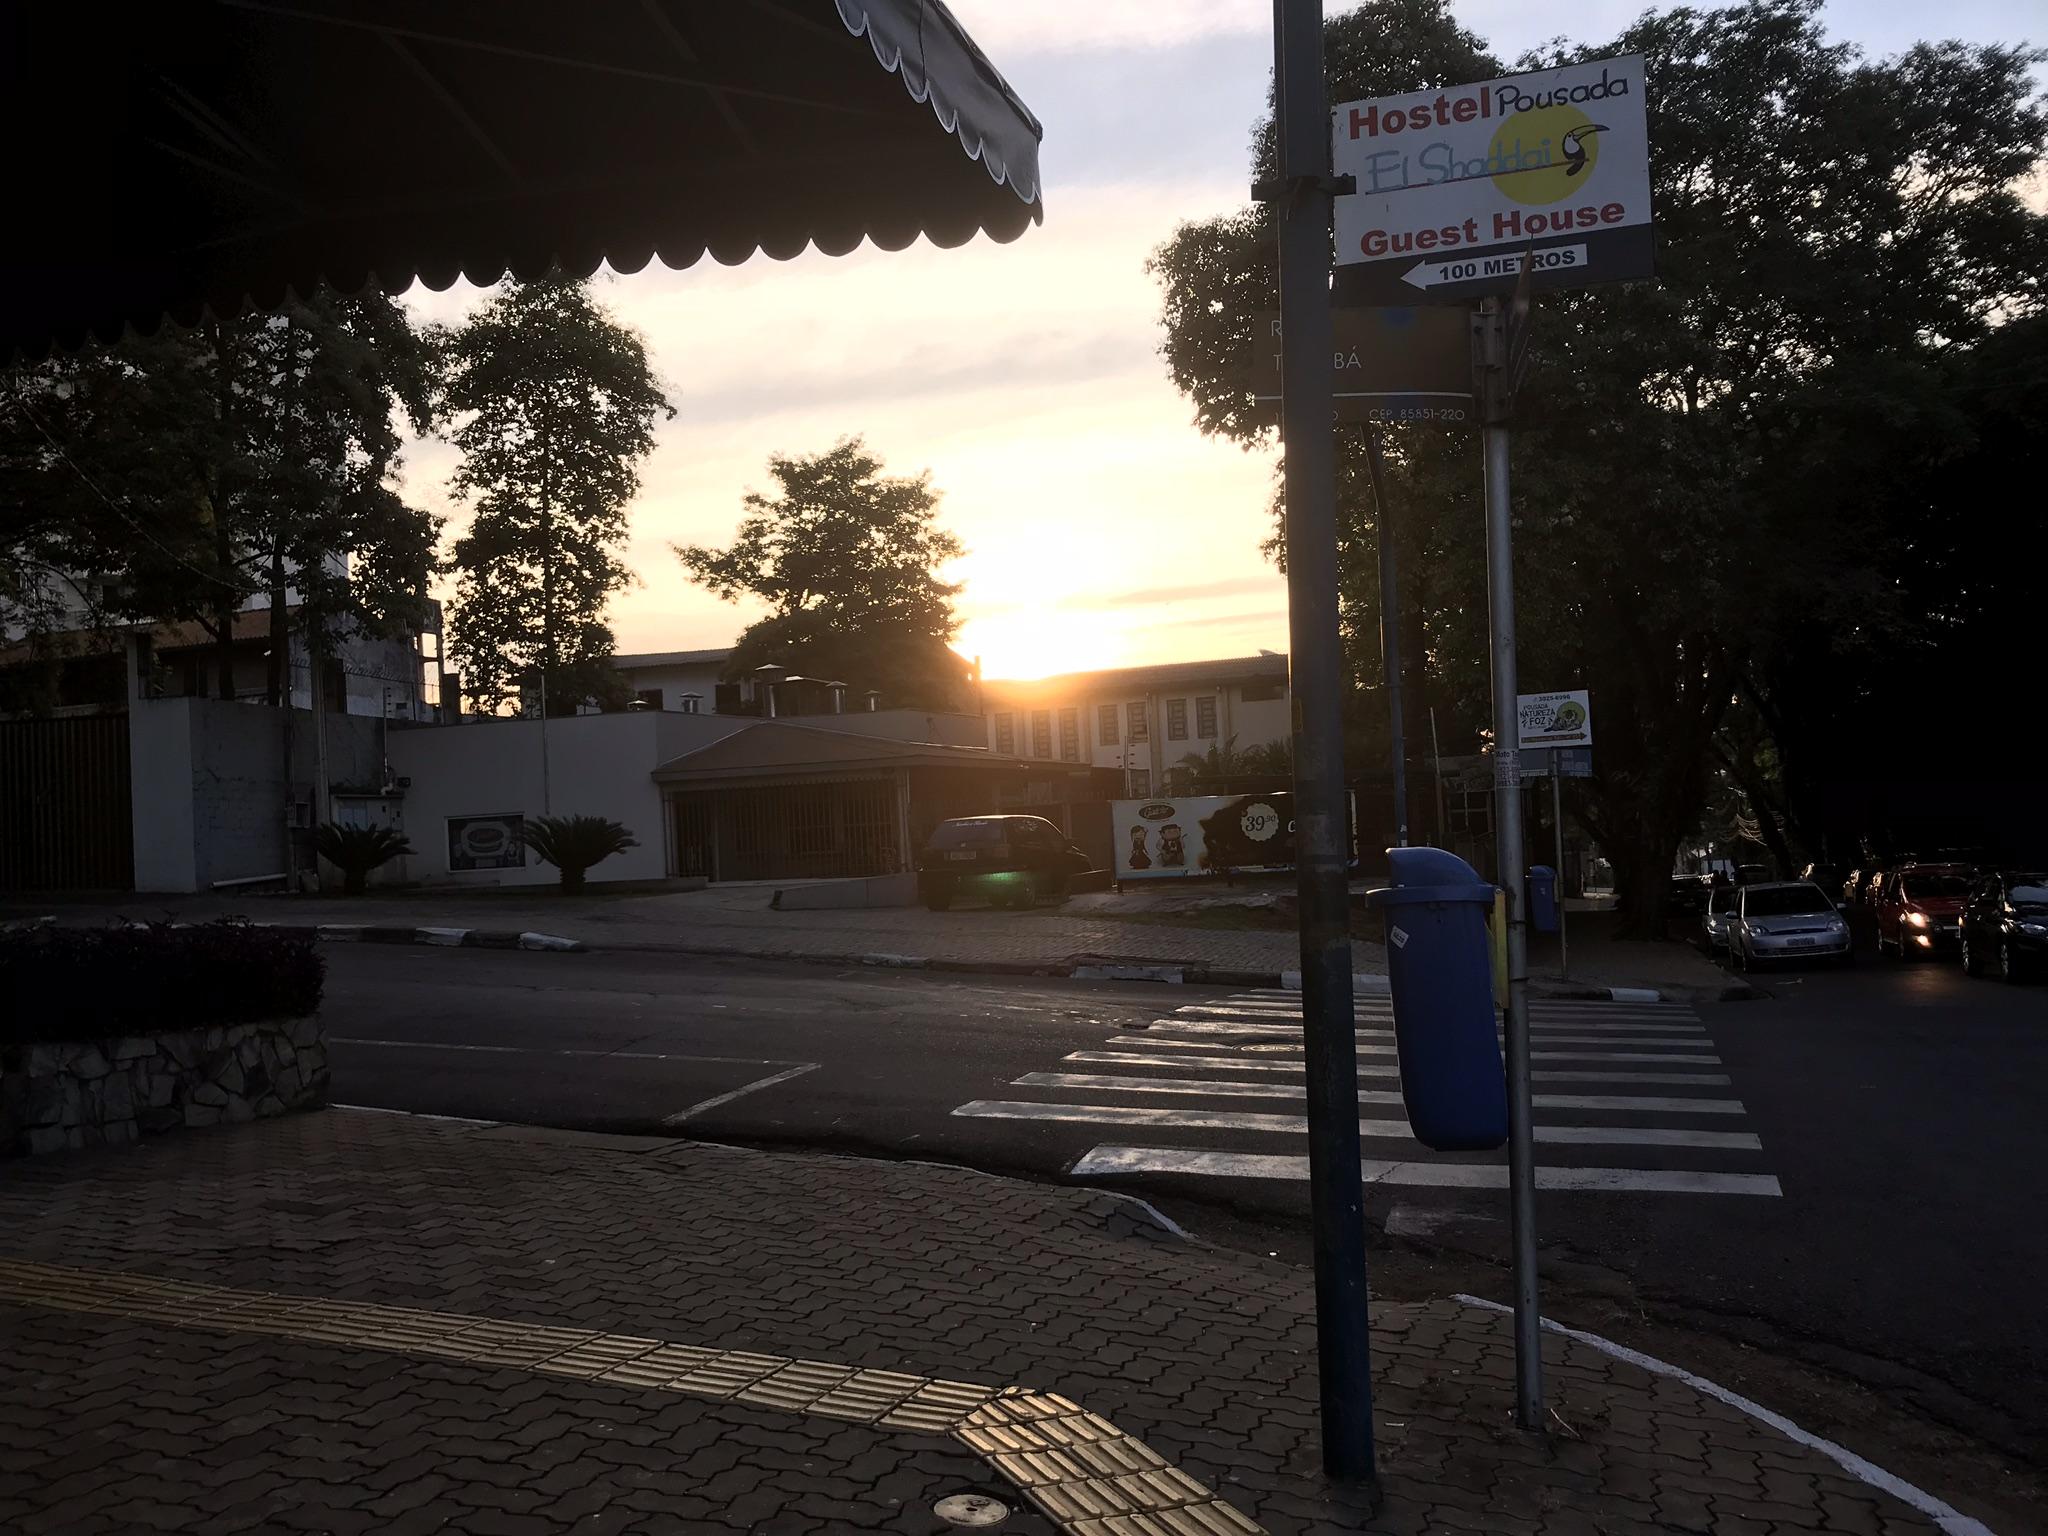 IMG_8974.jpg